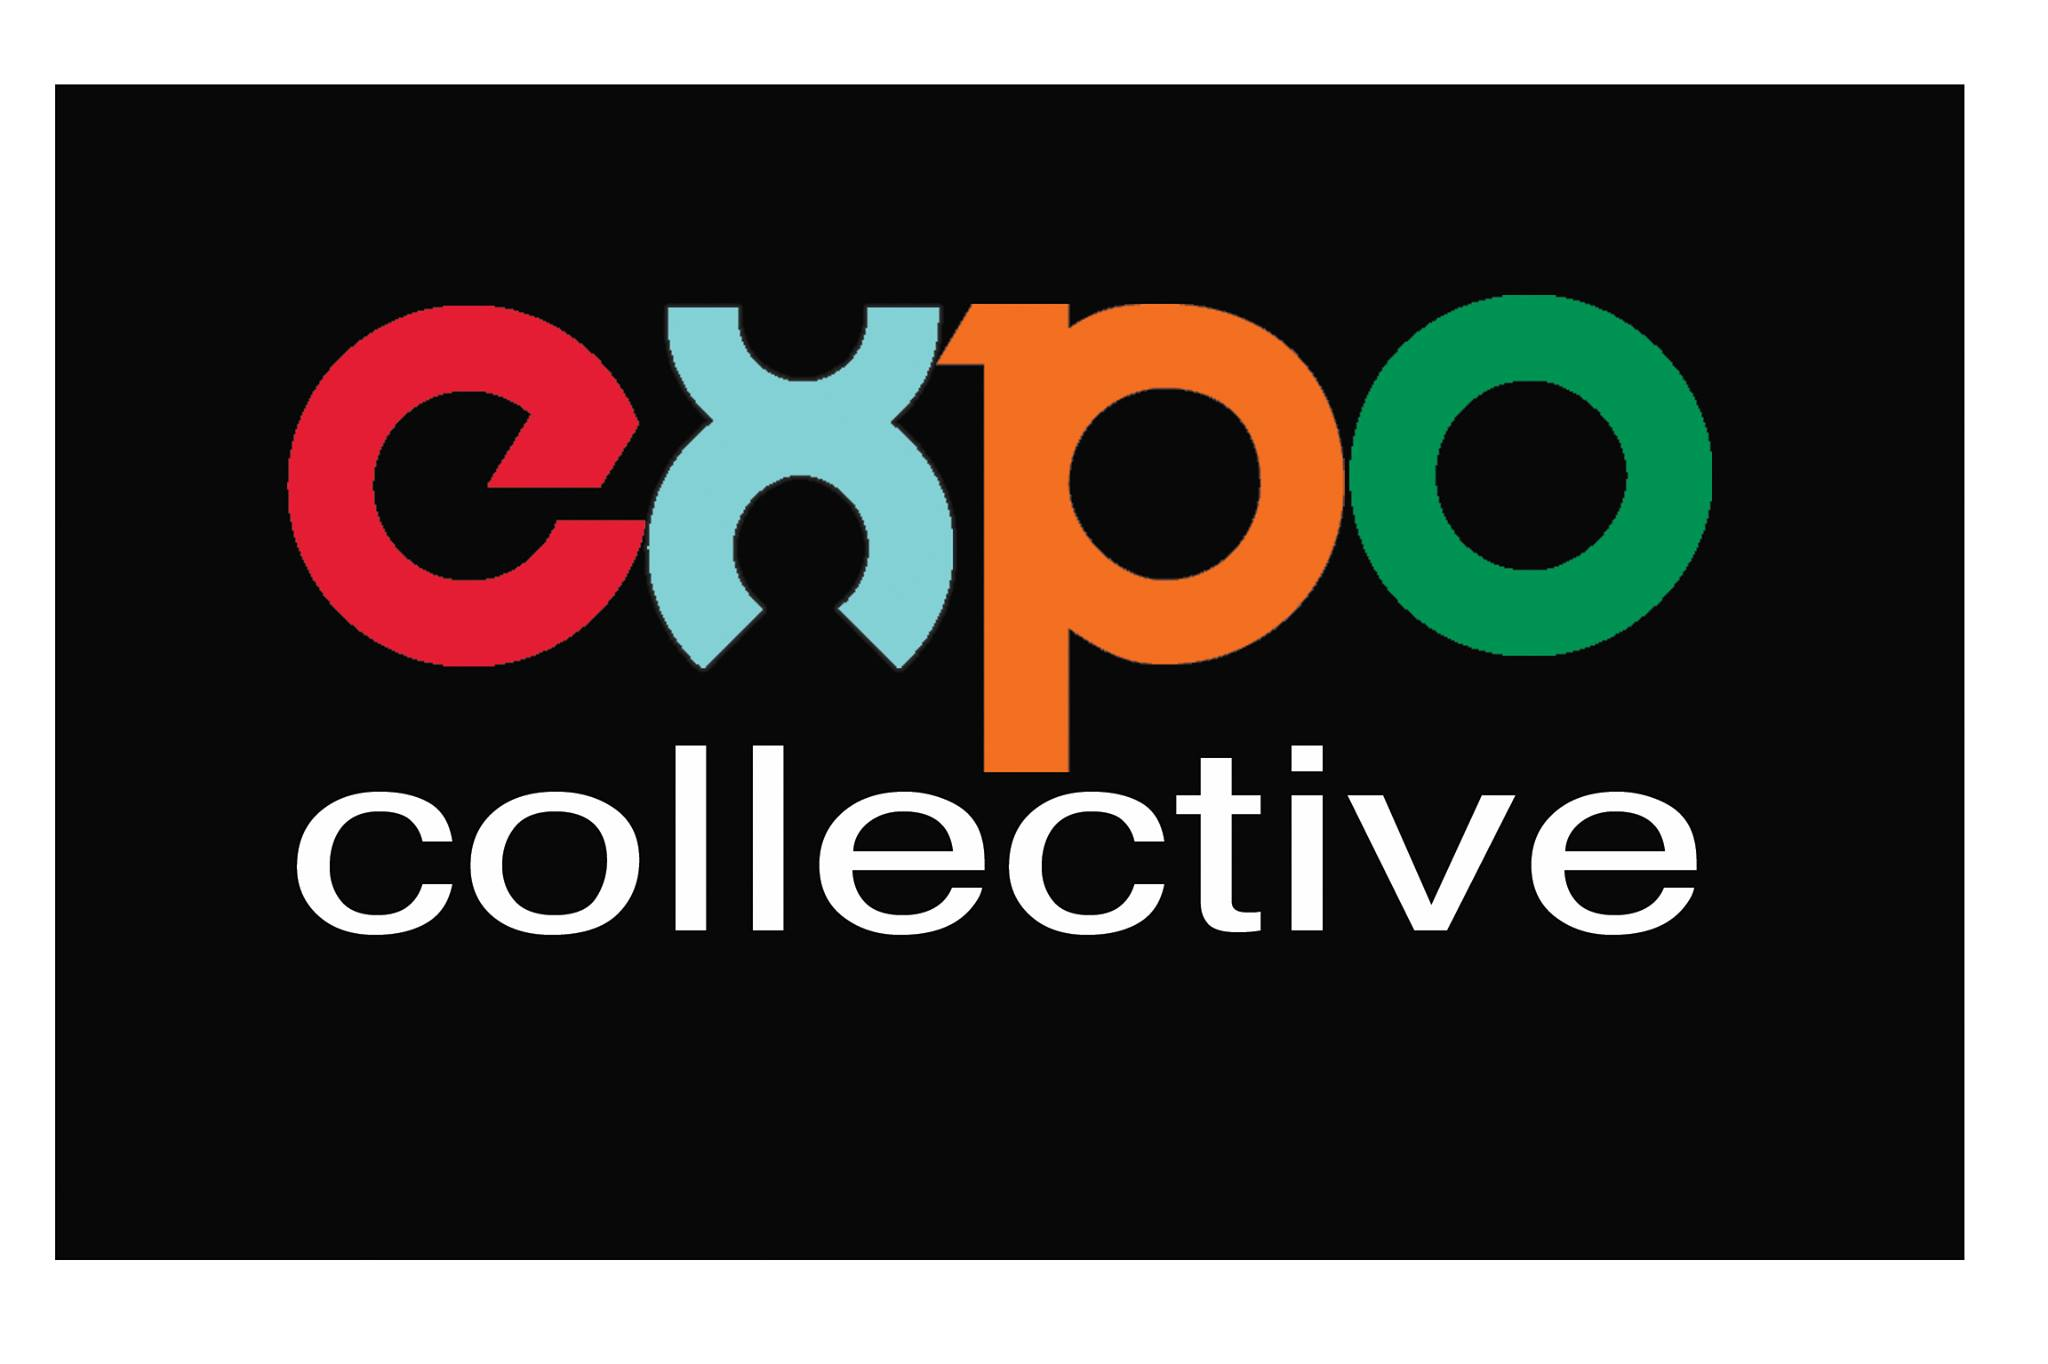 EXPO Collective